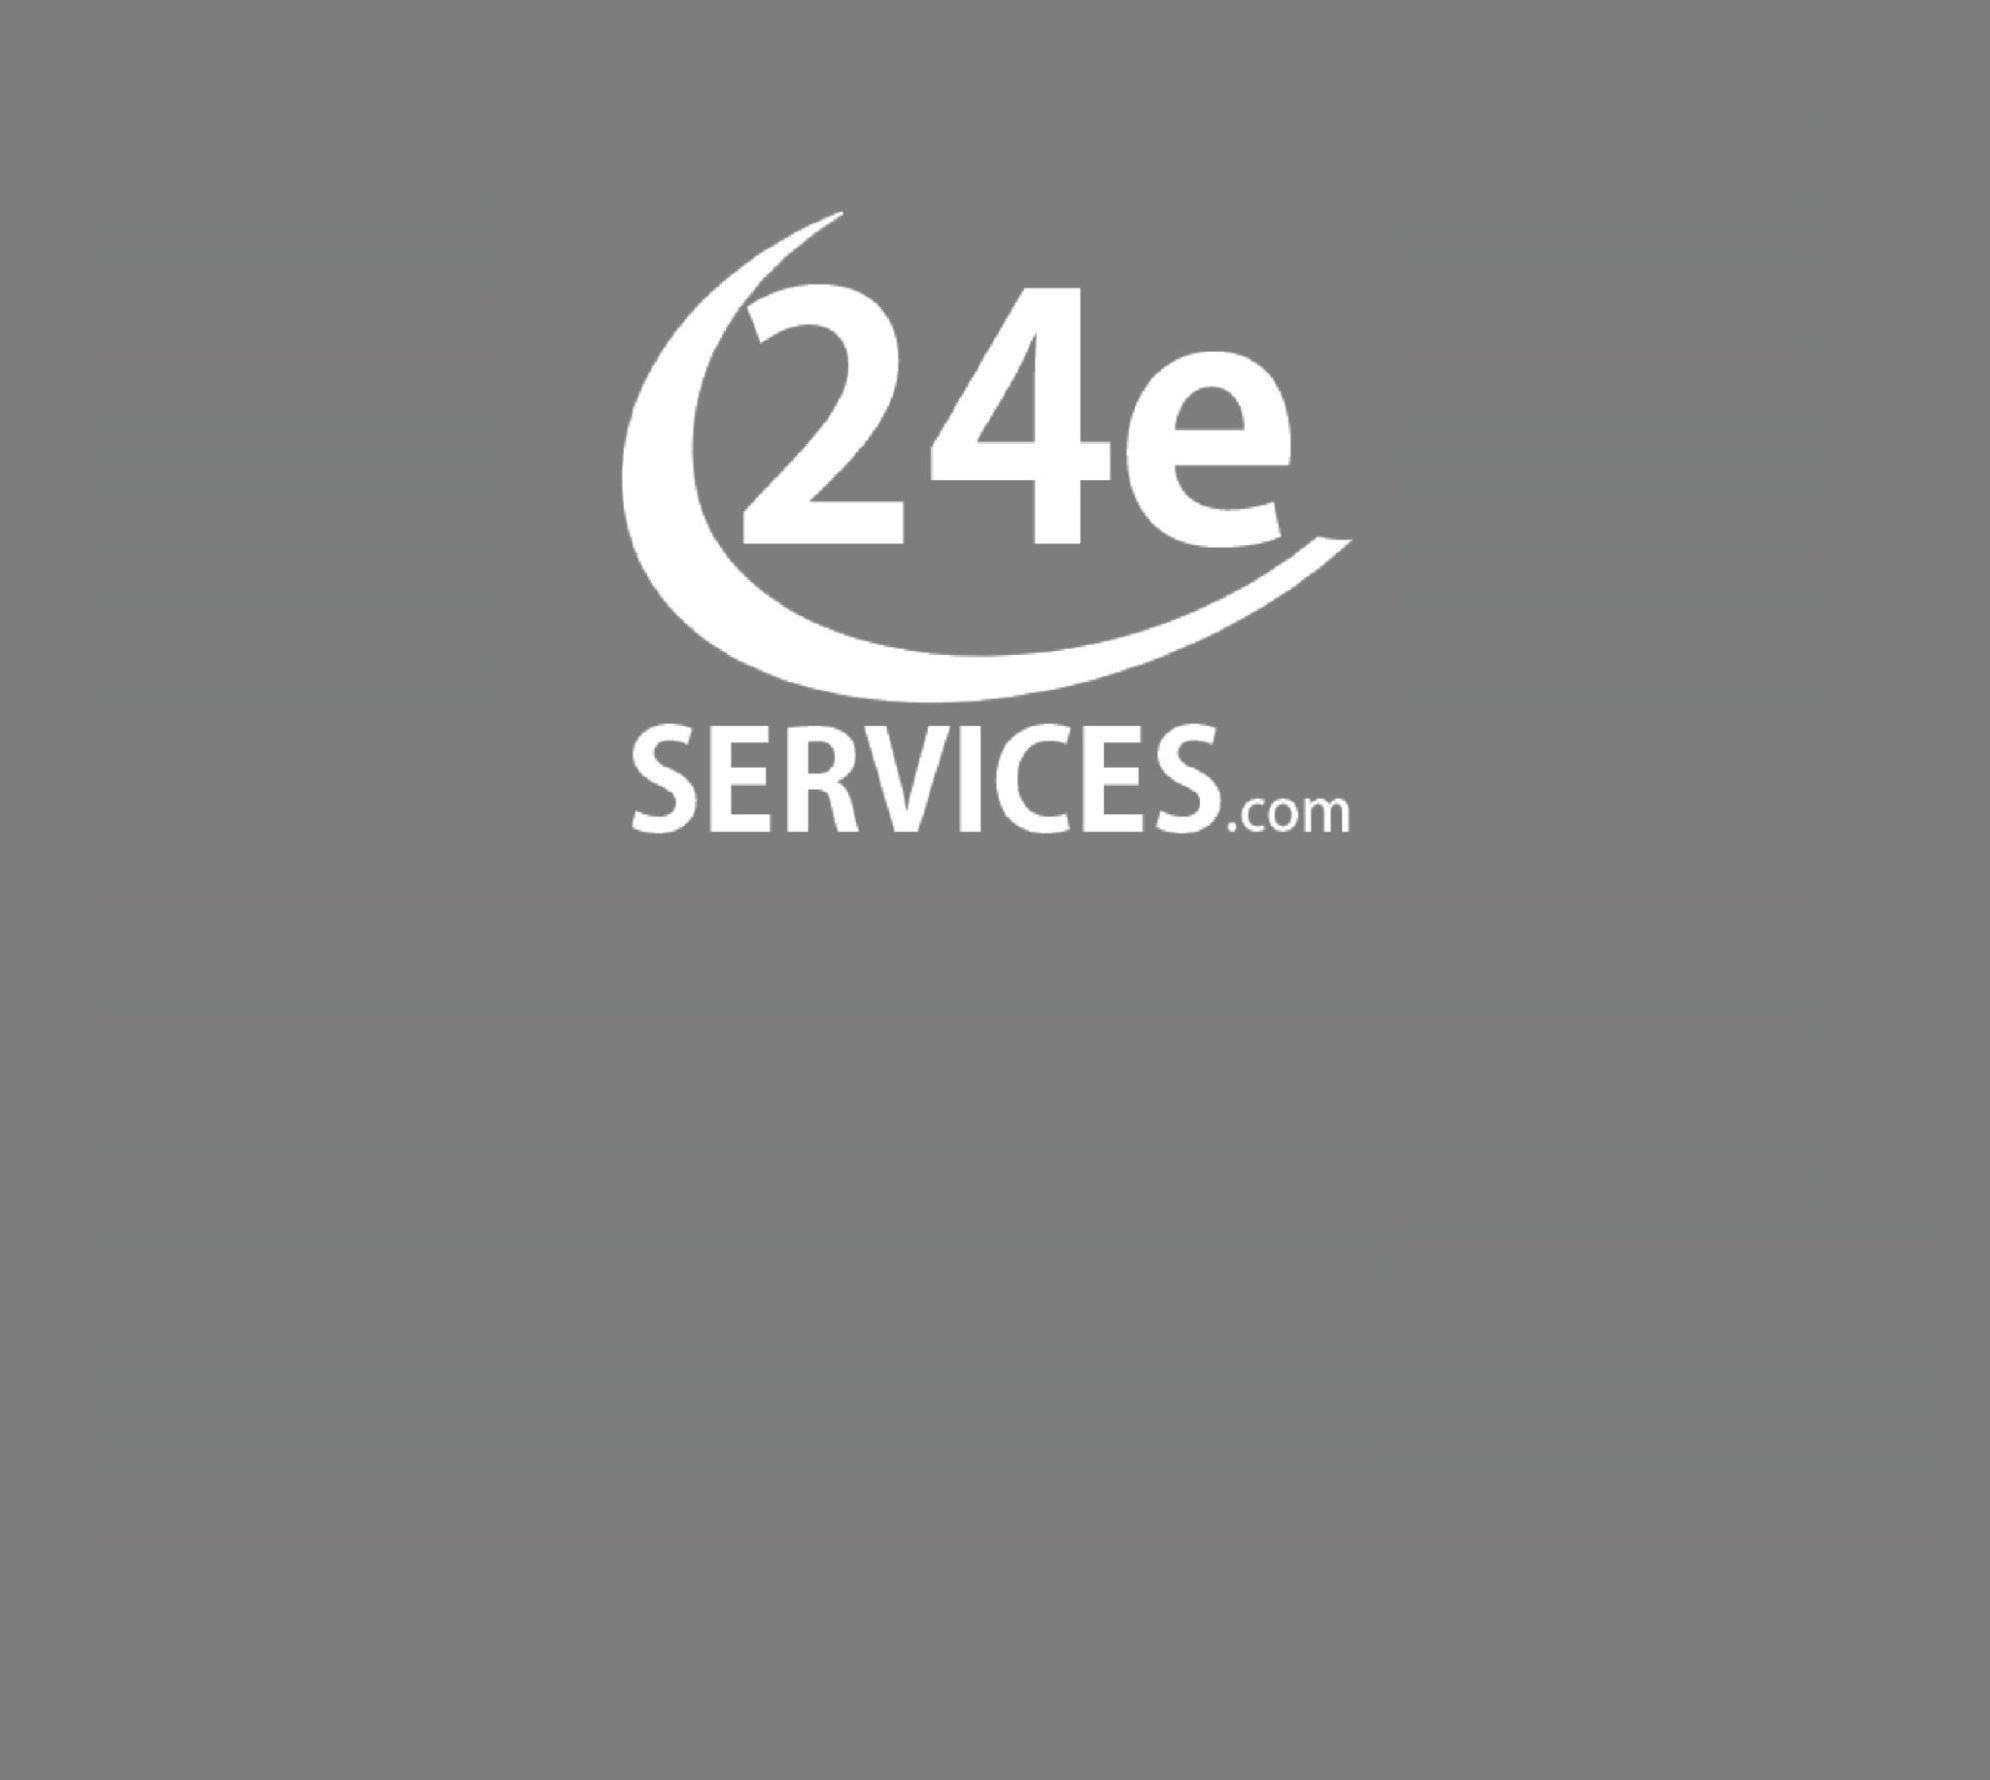 24e services